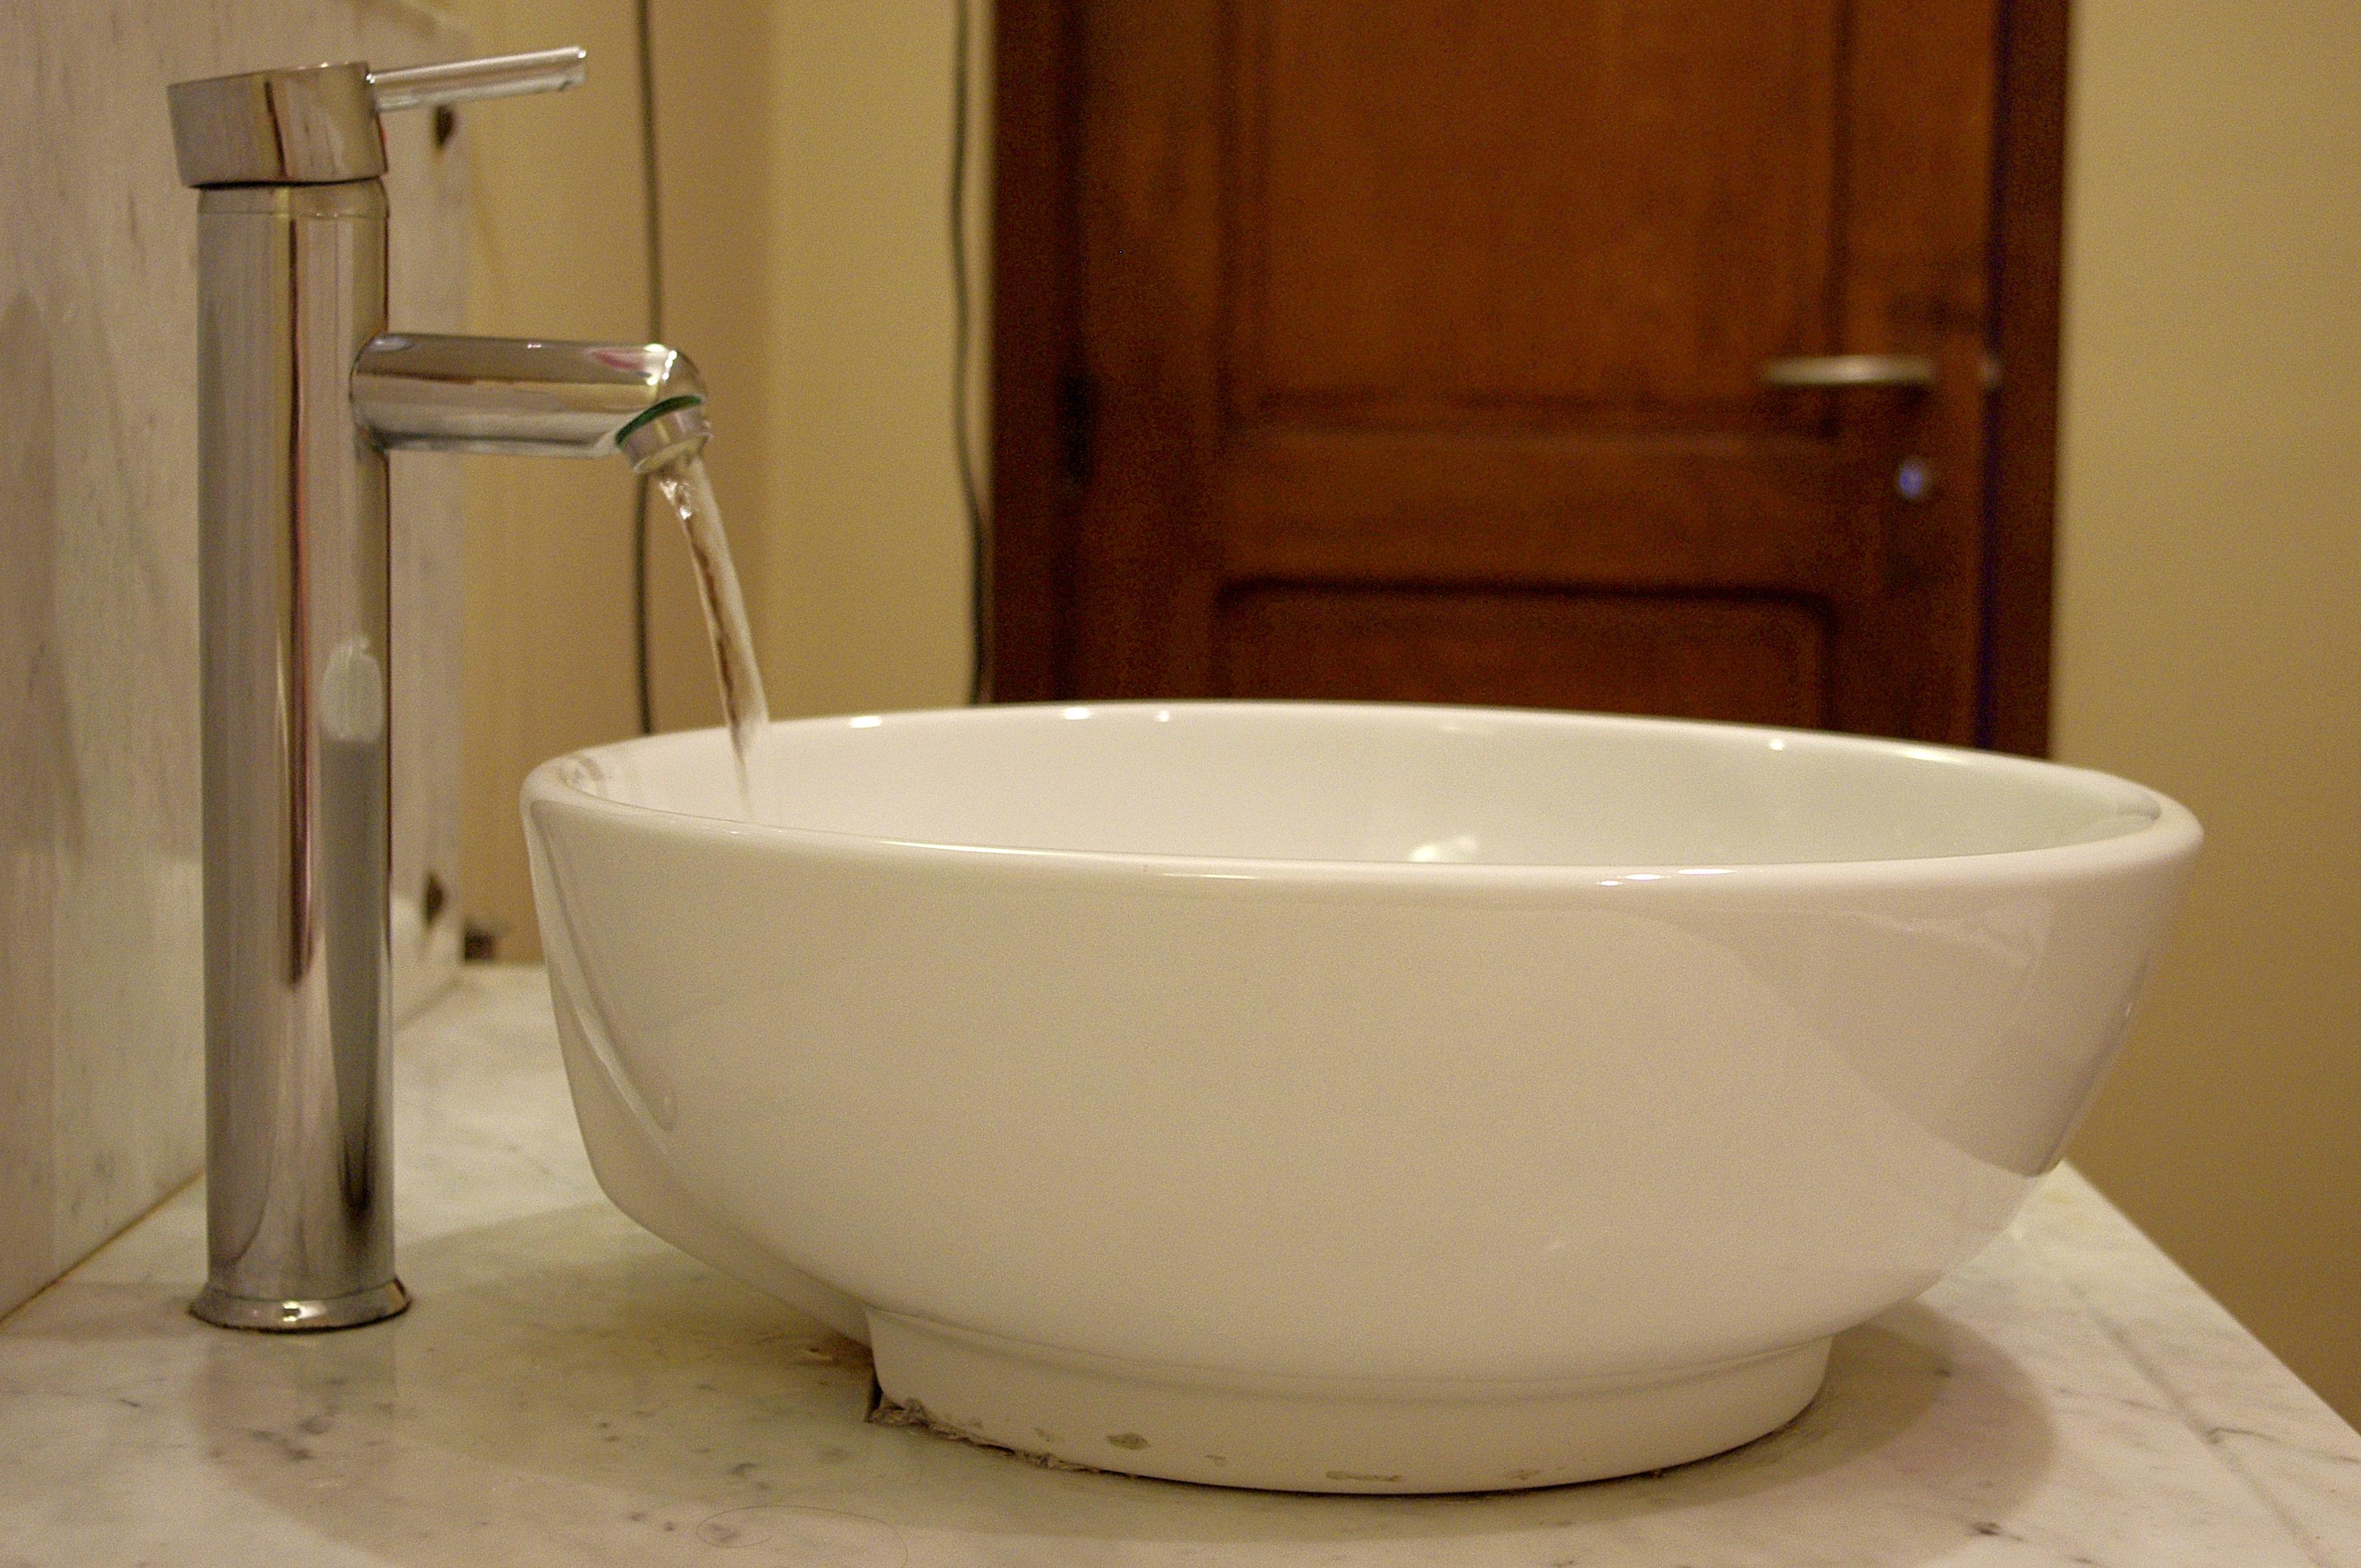 file lavabo vasque 02 jpg wikimedia commons. Black Bedroom Furniture Sets. Home Design Ideas